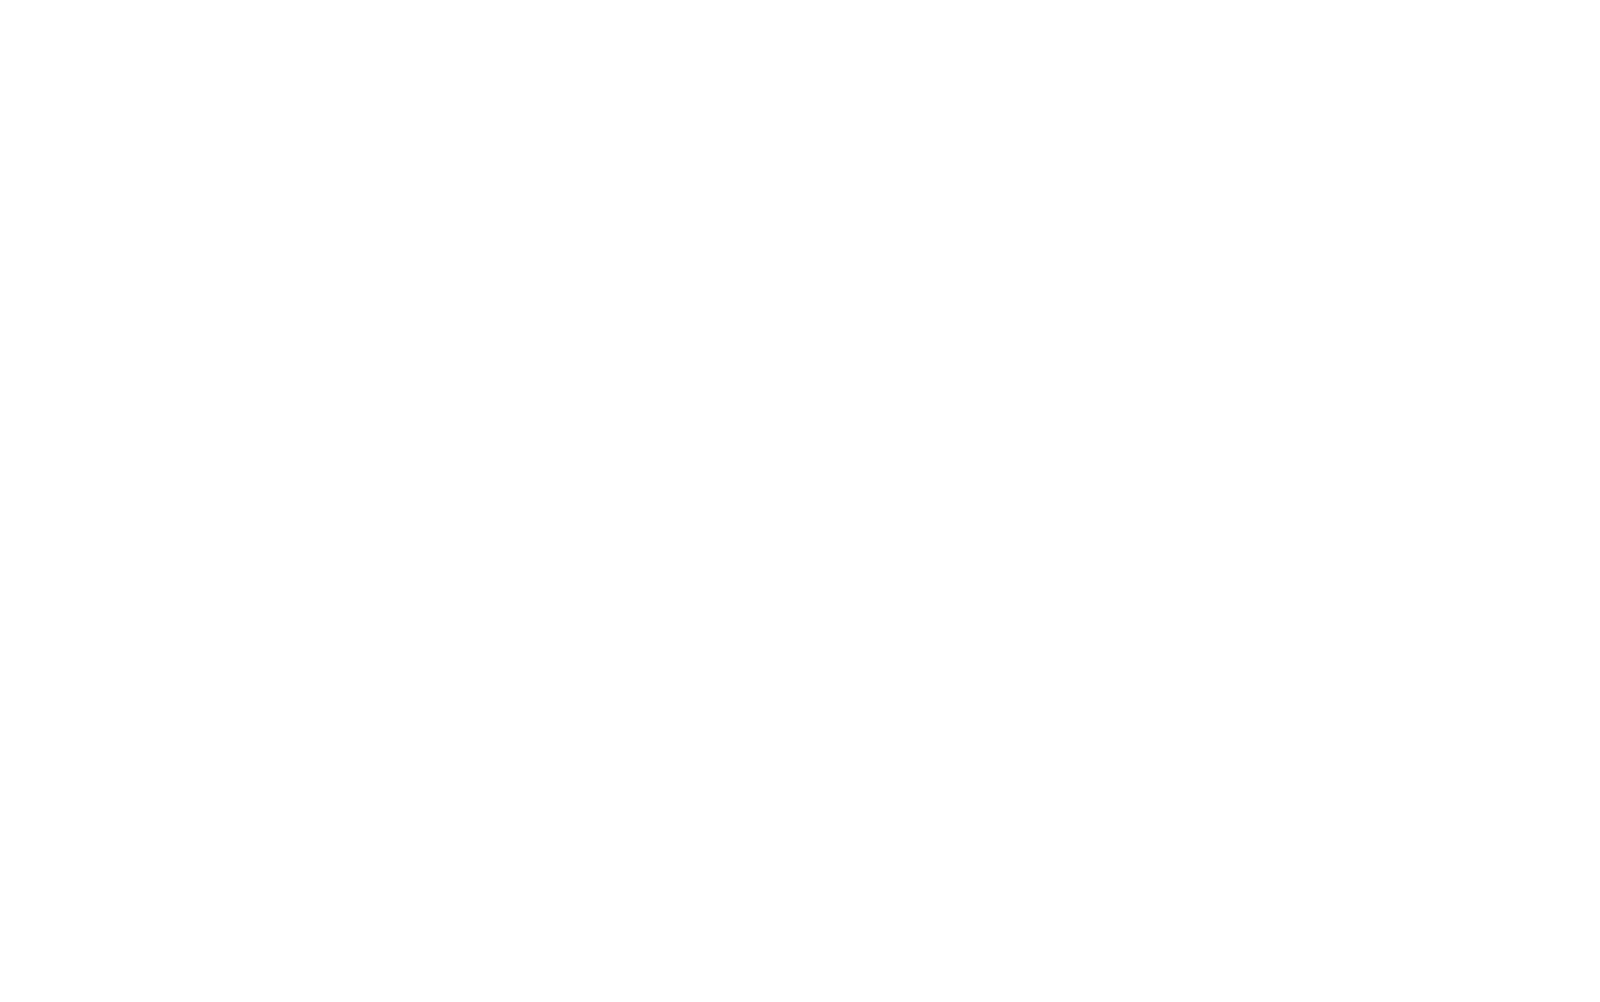 logo-leroy-merlin-png-7.png